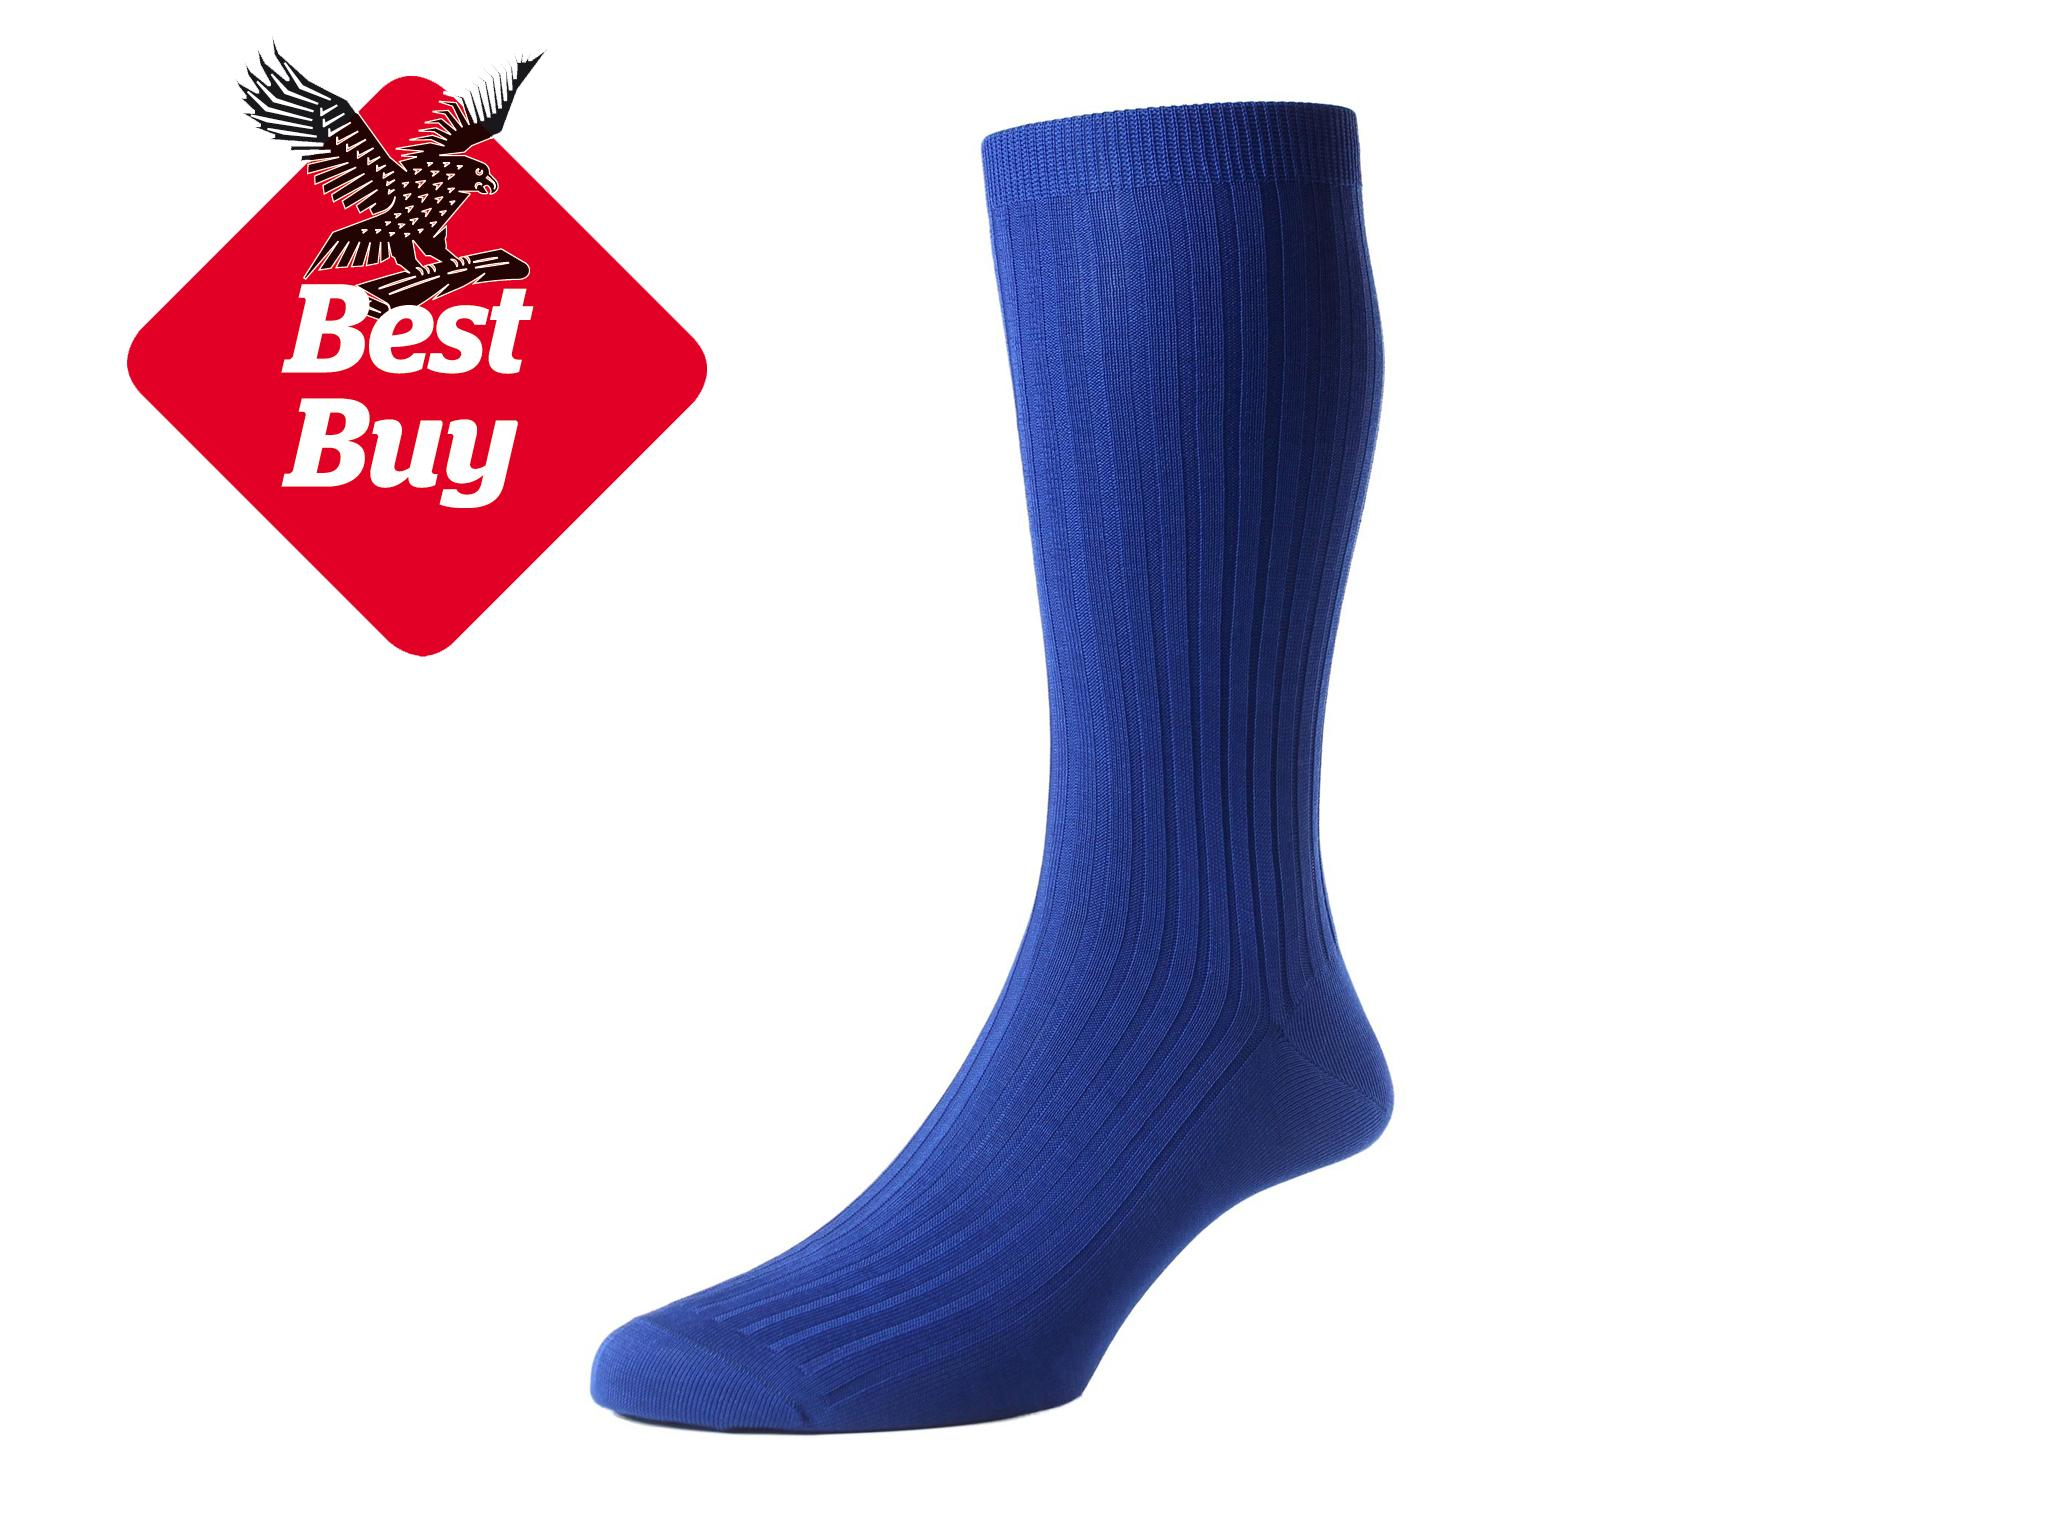 3f410588dbd87 Pantherella Danvers Rib Cotton Lisle Socks: £12, Pantherella